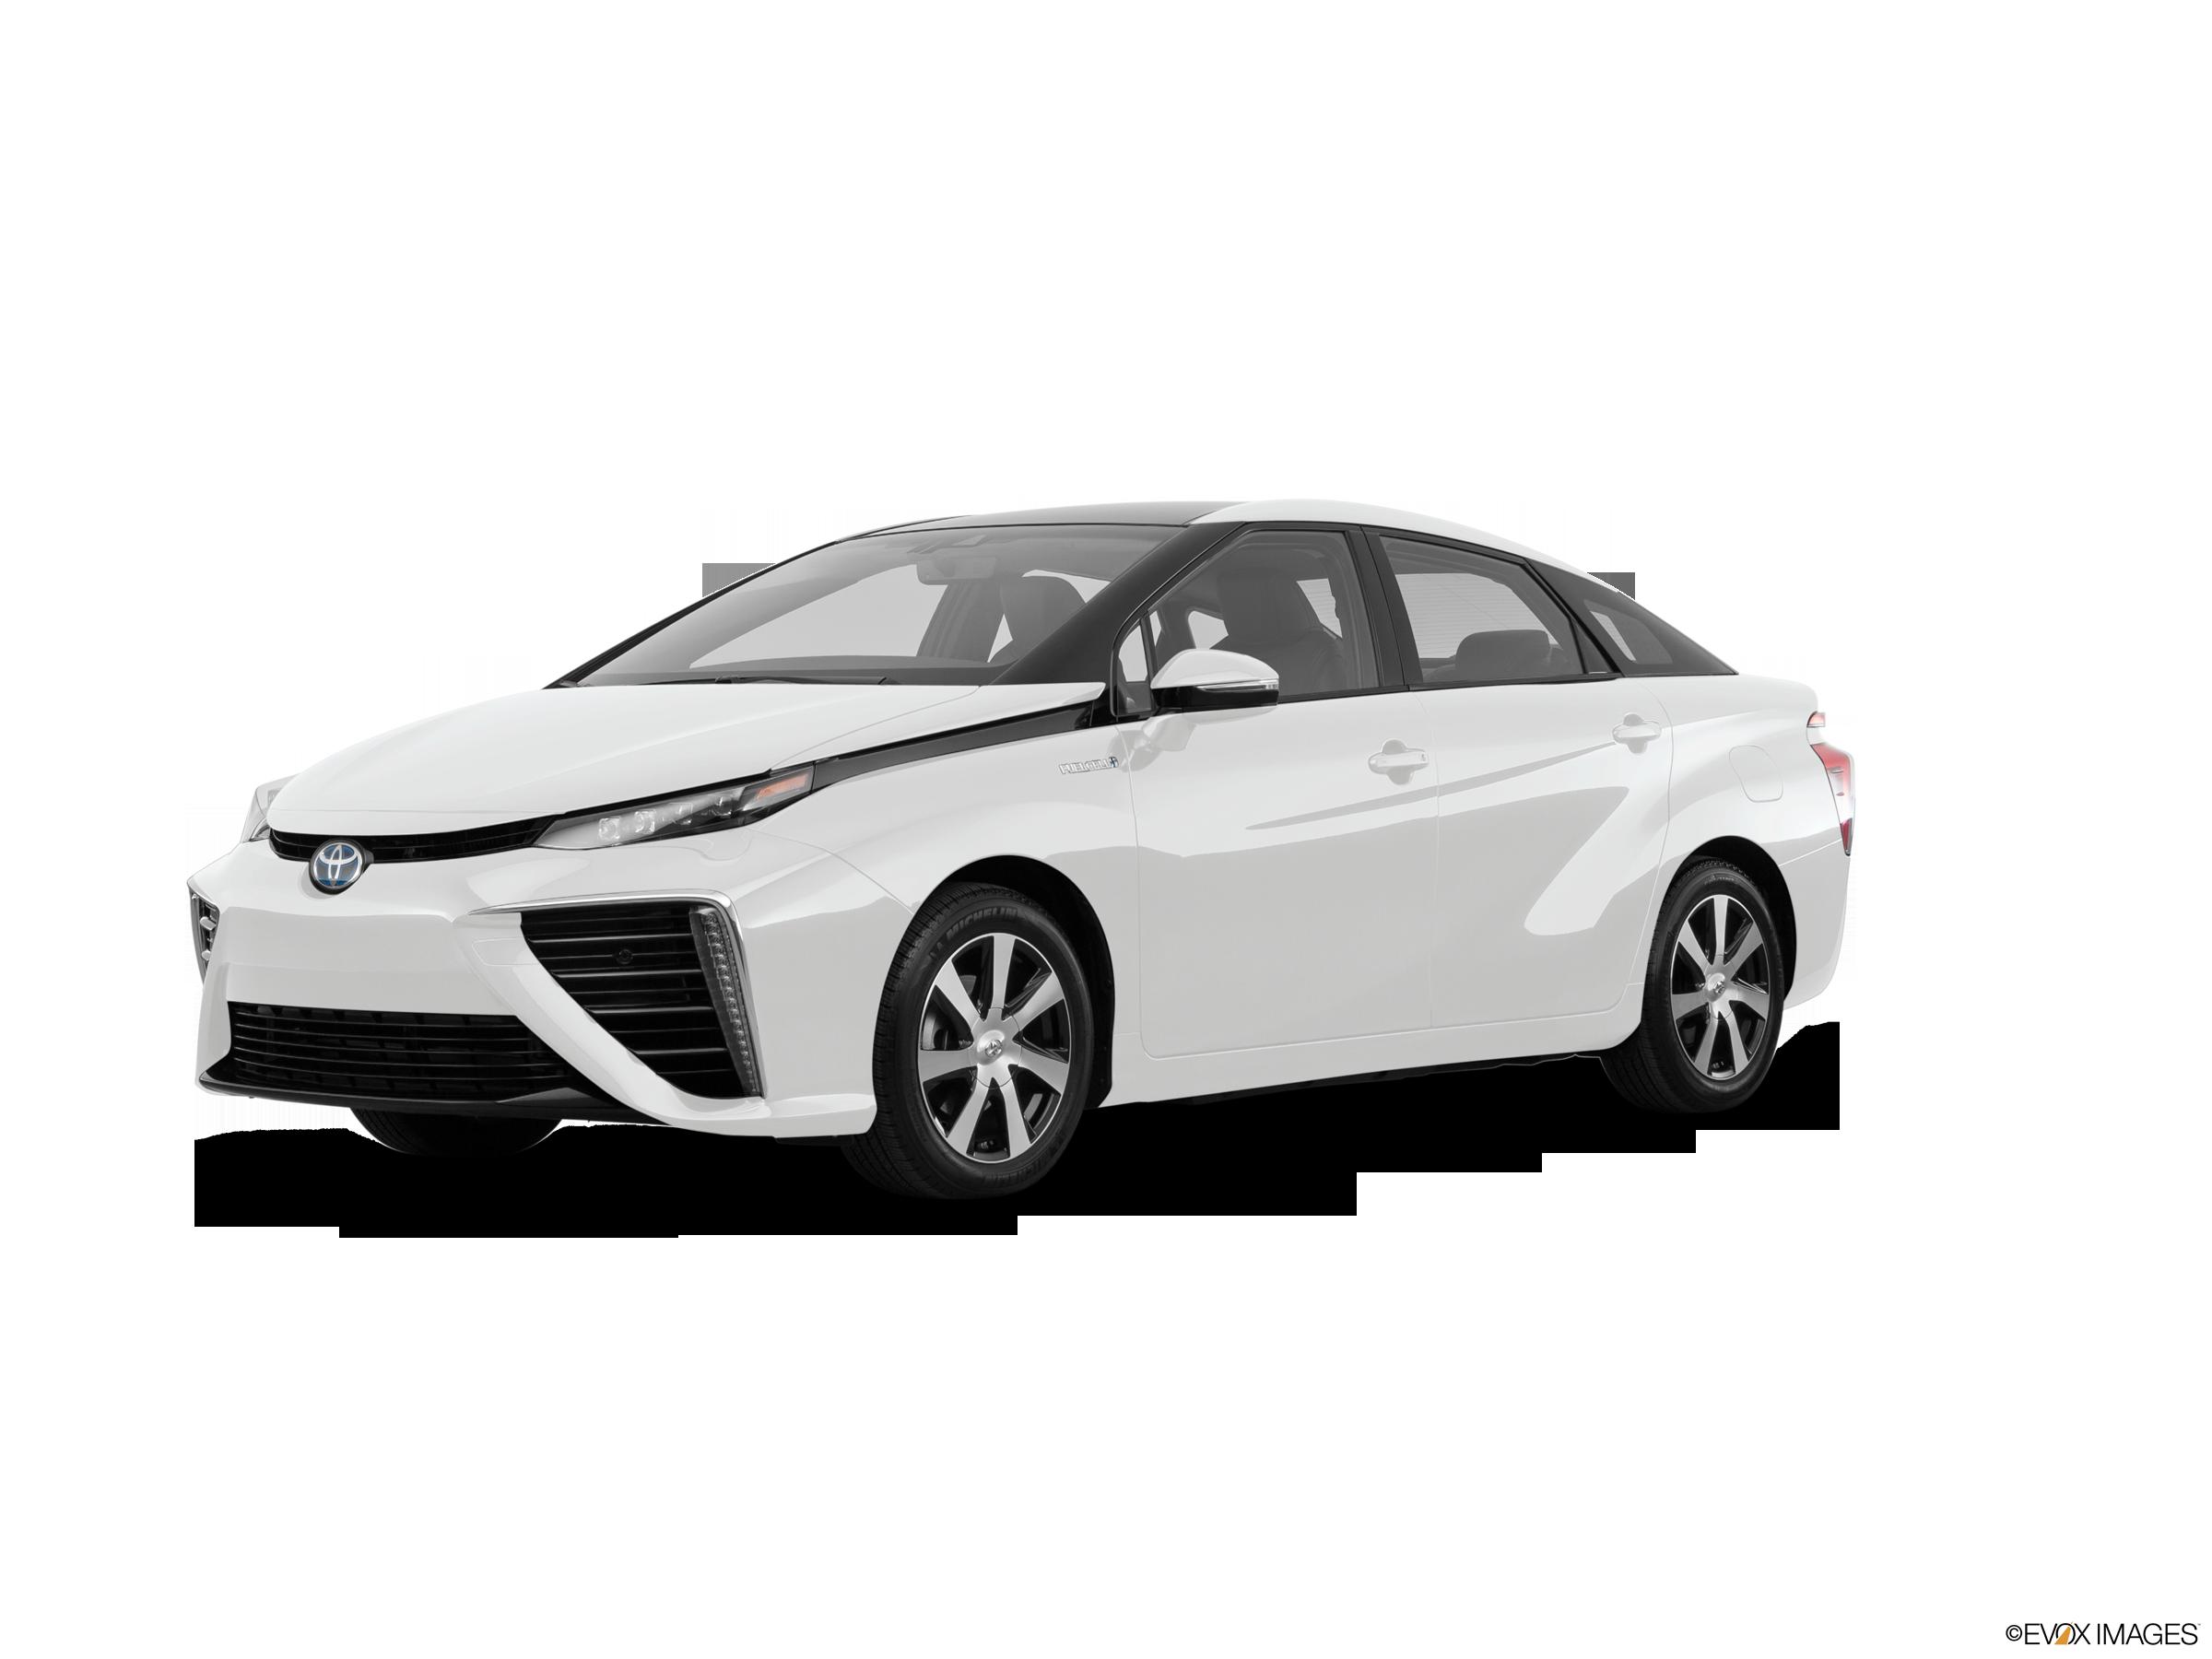 Kelebihan Kekurangan Toyota 2017 Murah Berkualitas